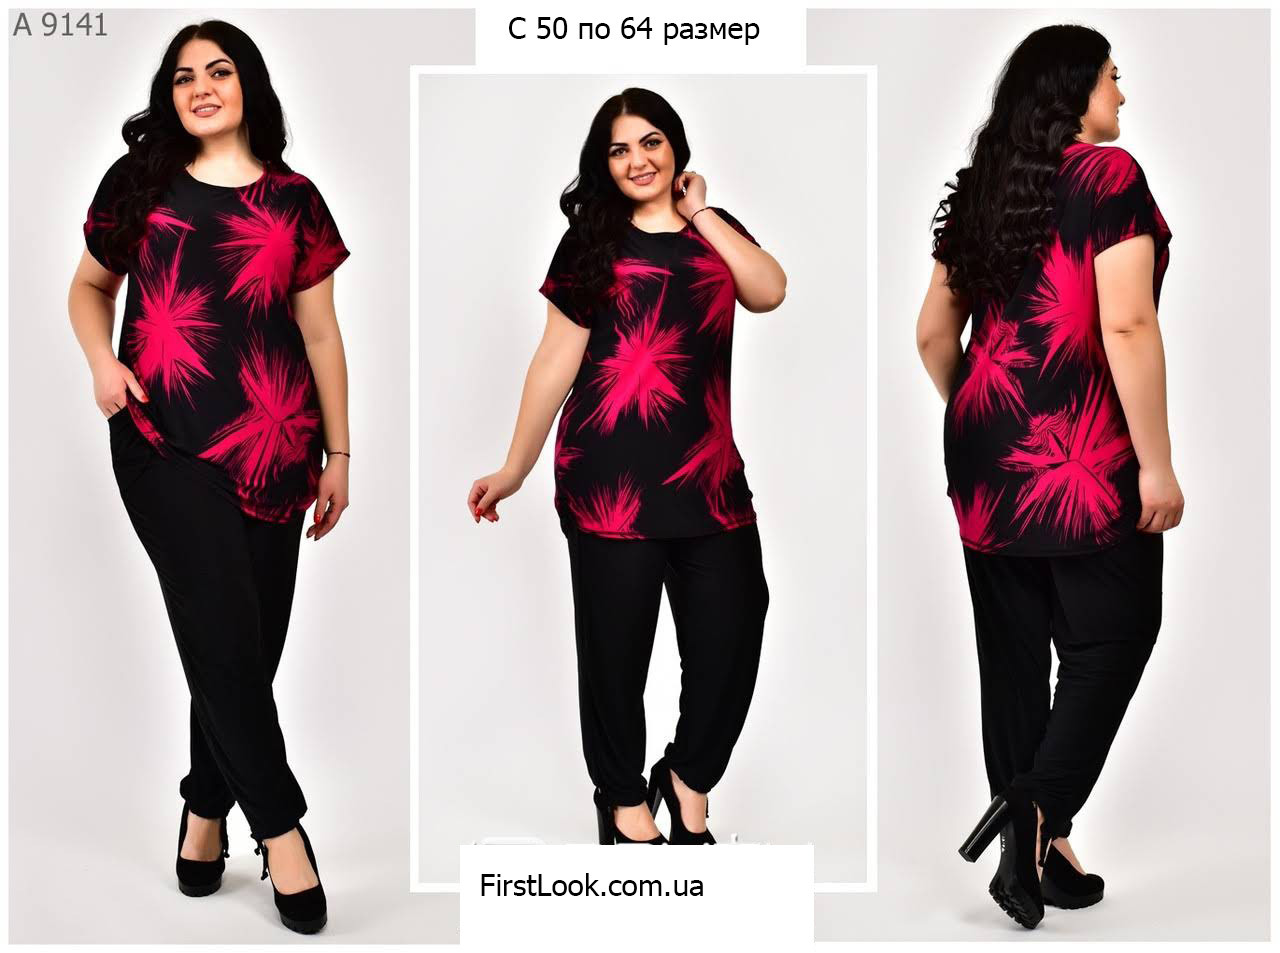 Женский костюм-трикотаж масло-(с 50-64 размер)